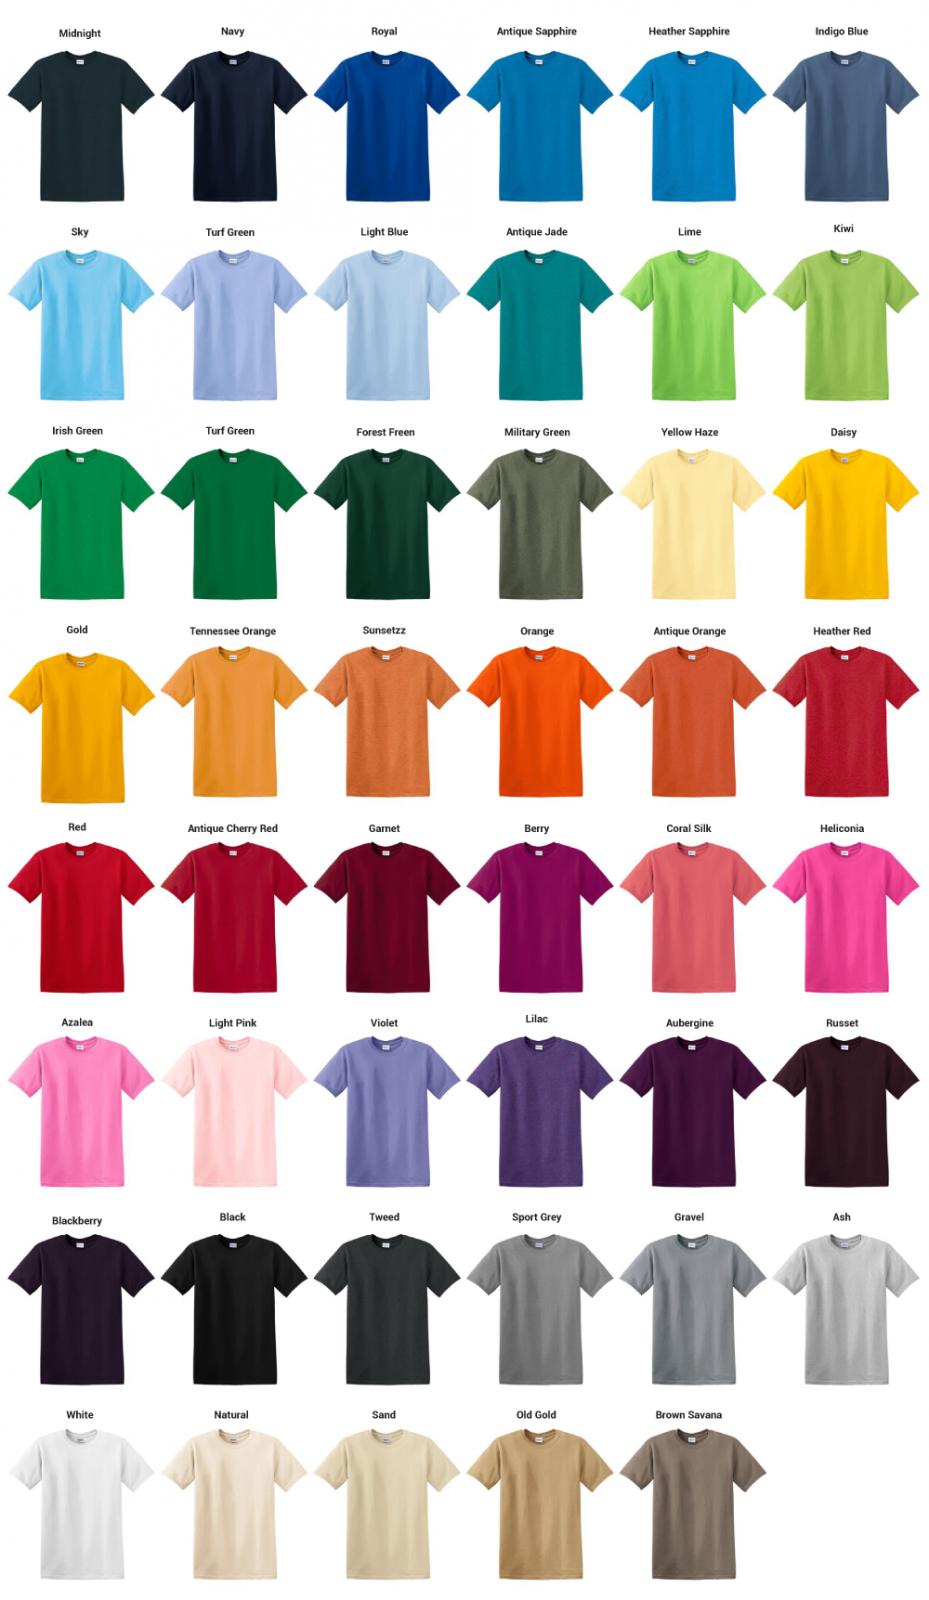 24 custom printed t shirts screen print 2 colors on for 24 t shirt printing